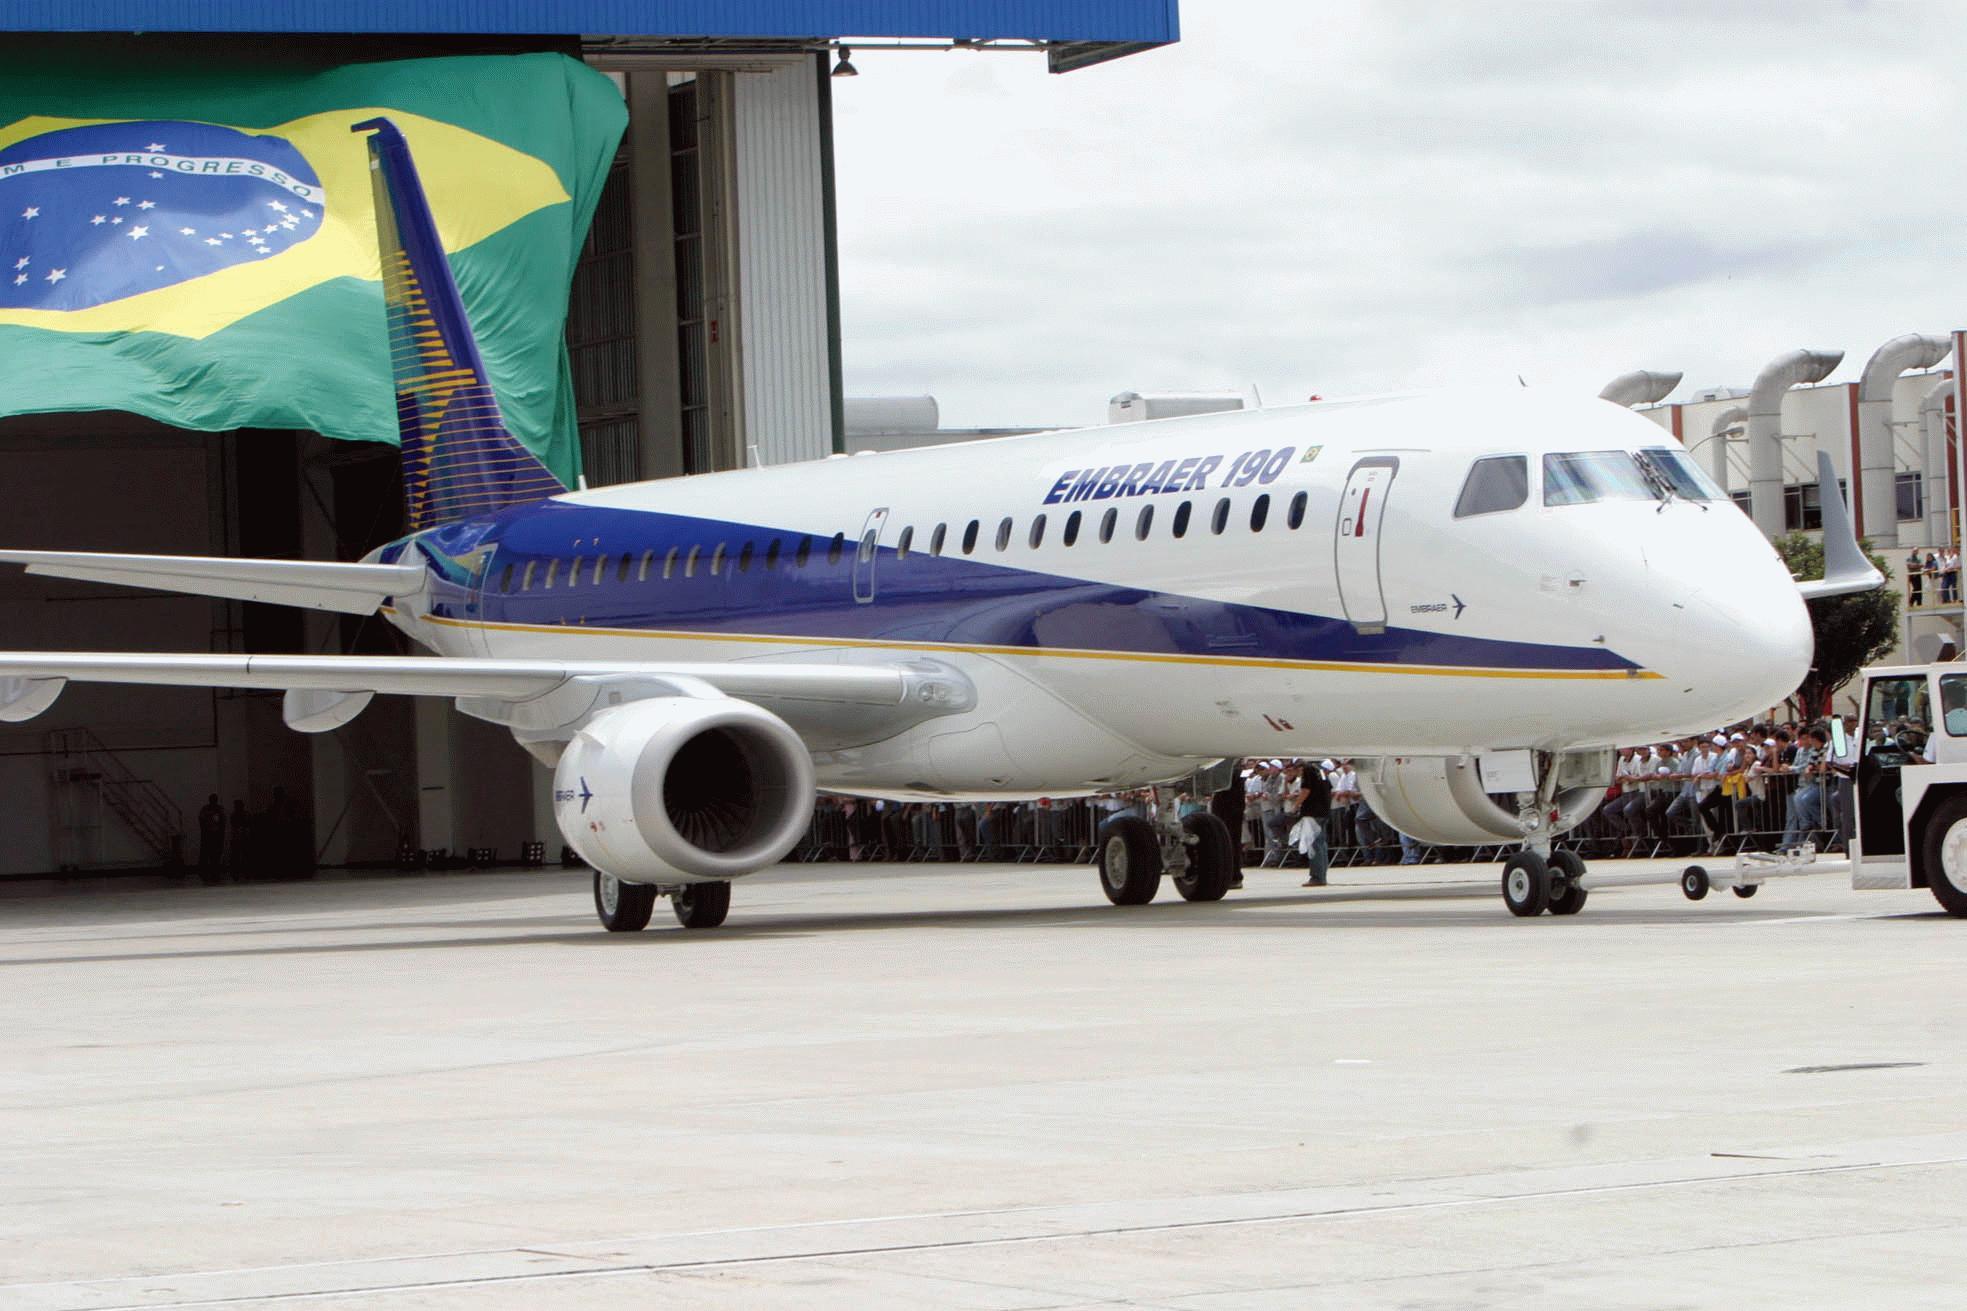 Ur Dpb Dniproavia Embraer Erj 145lr Editorial Photo Image Of Arrivals